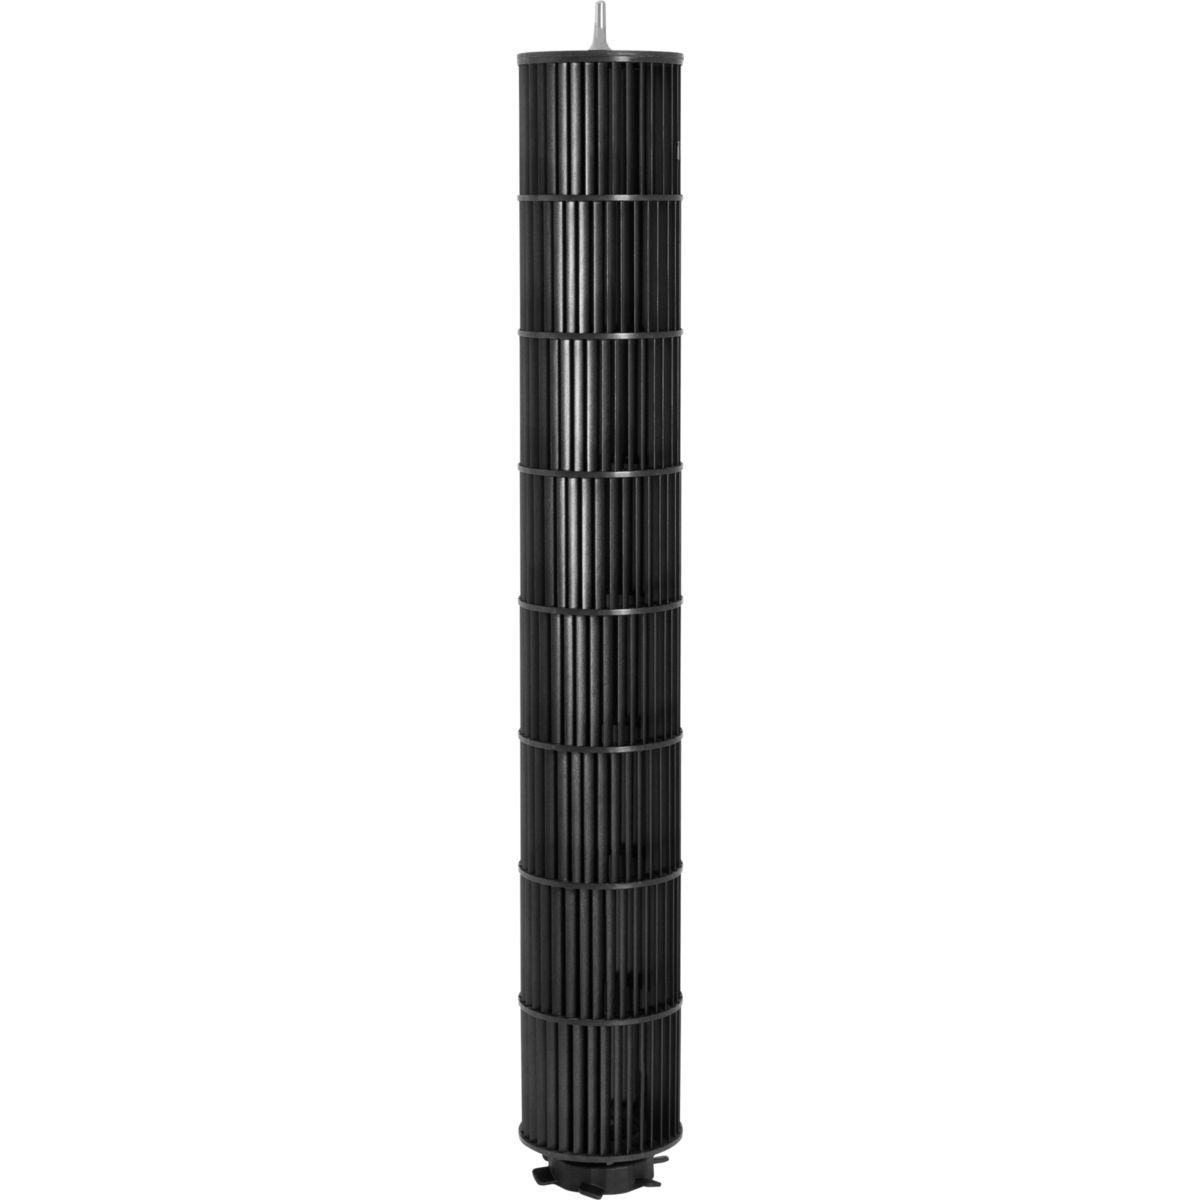 ewt turbulence ventilateur colonne oscillant 3 vitesses. Black Bedroom Furniture Sets. Home Design Ideas